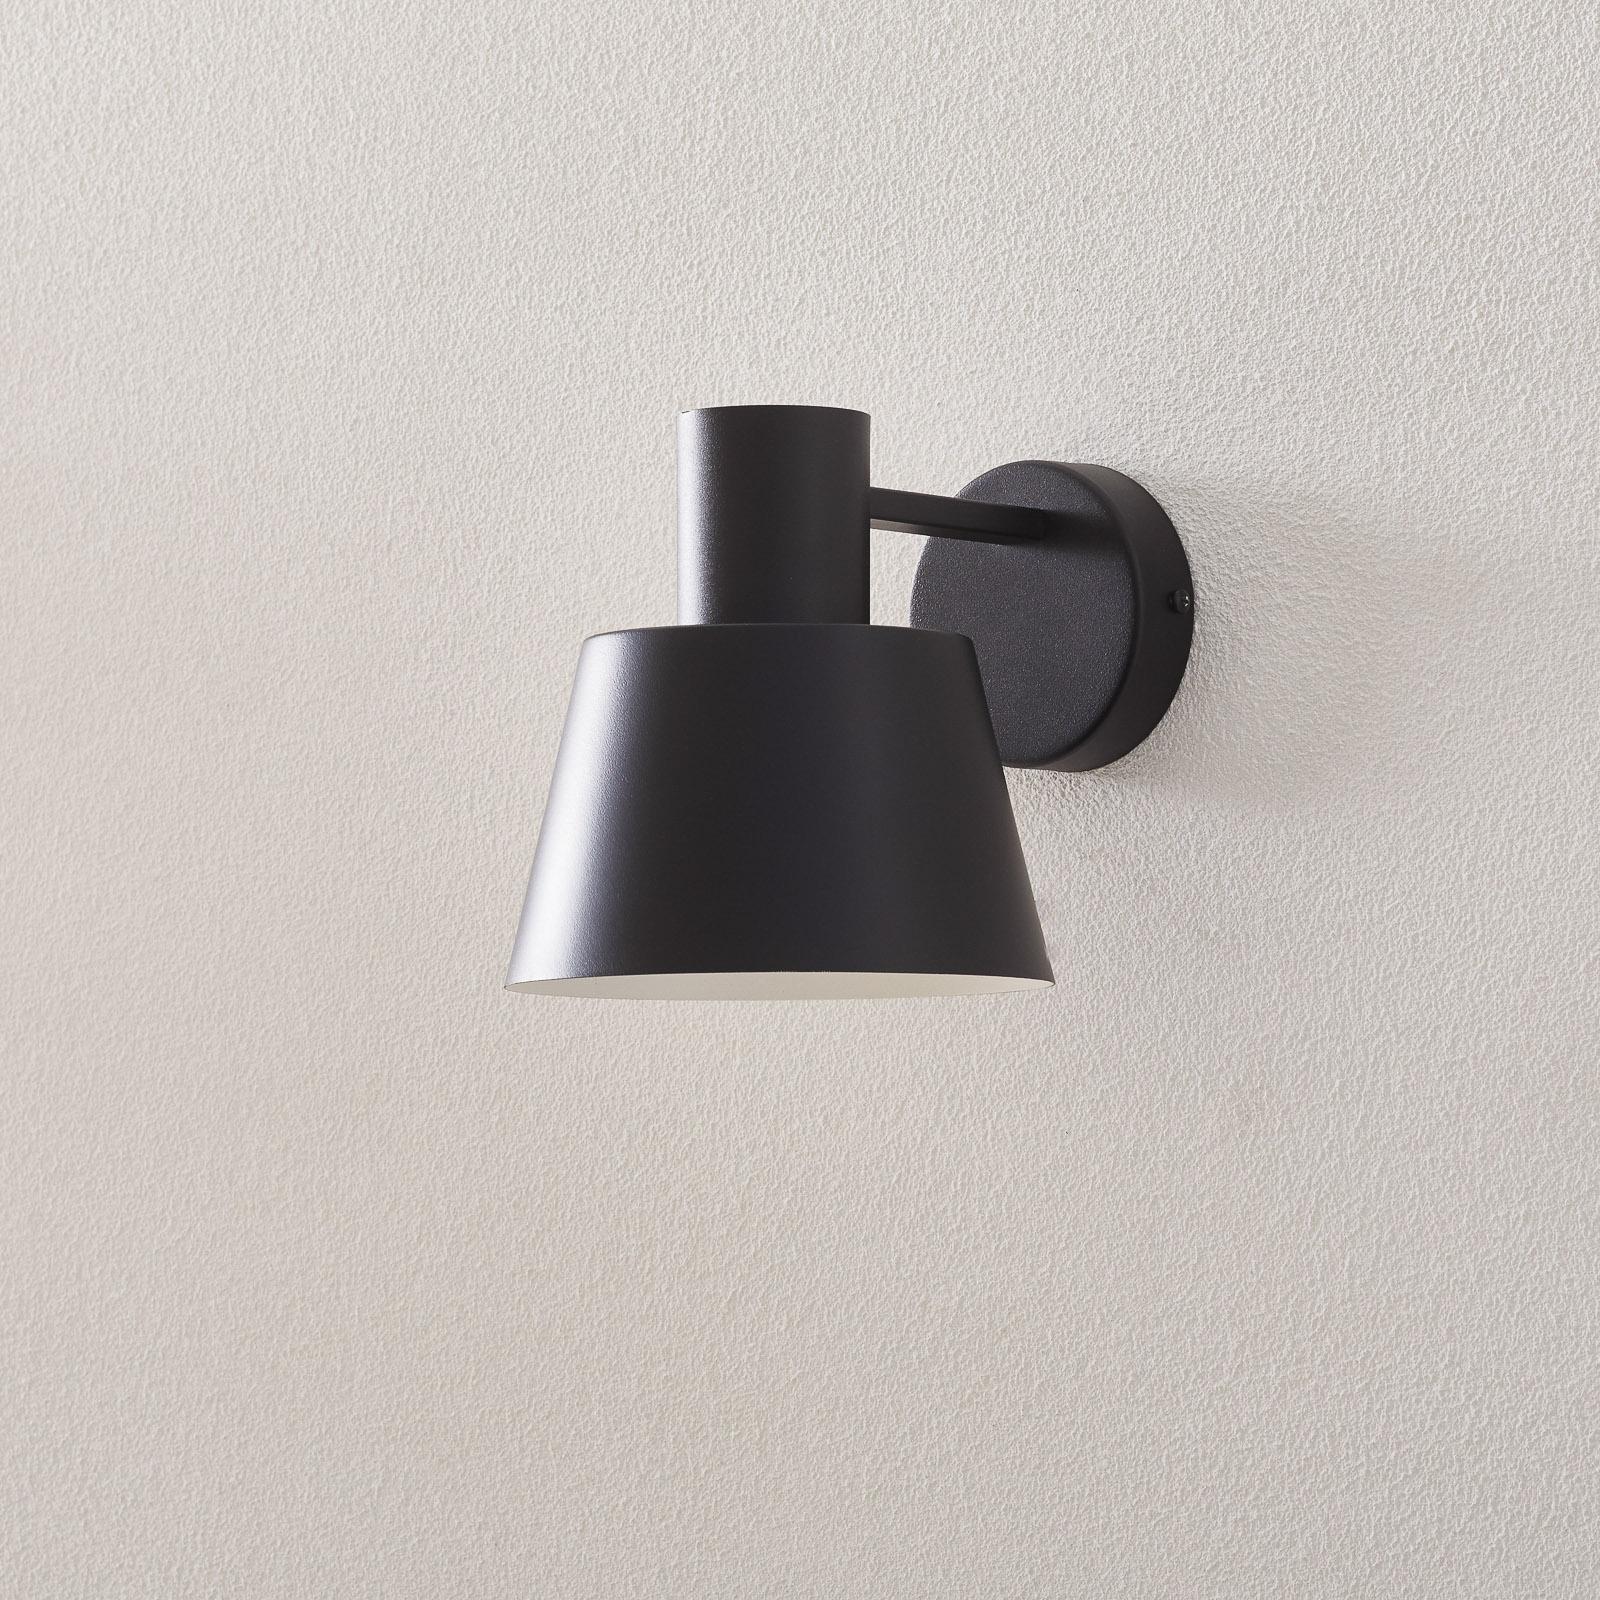 Wandlamp Dunka van metaal, 1-lamp, zwart